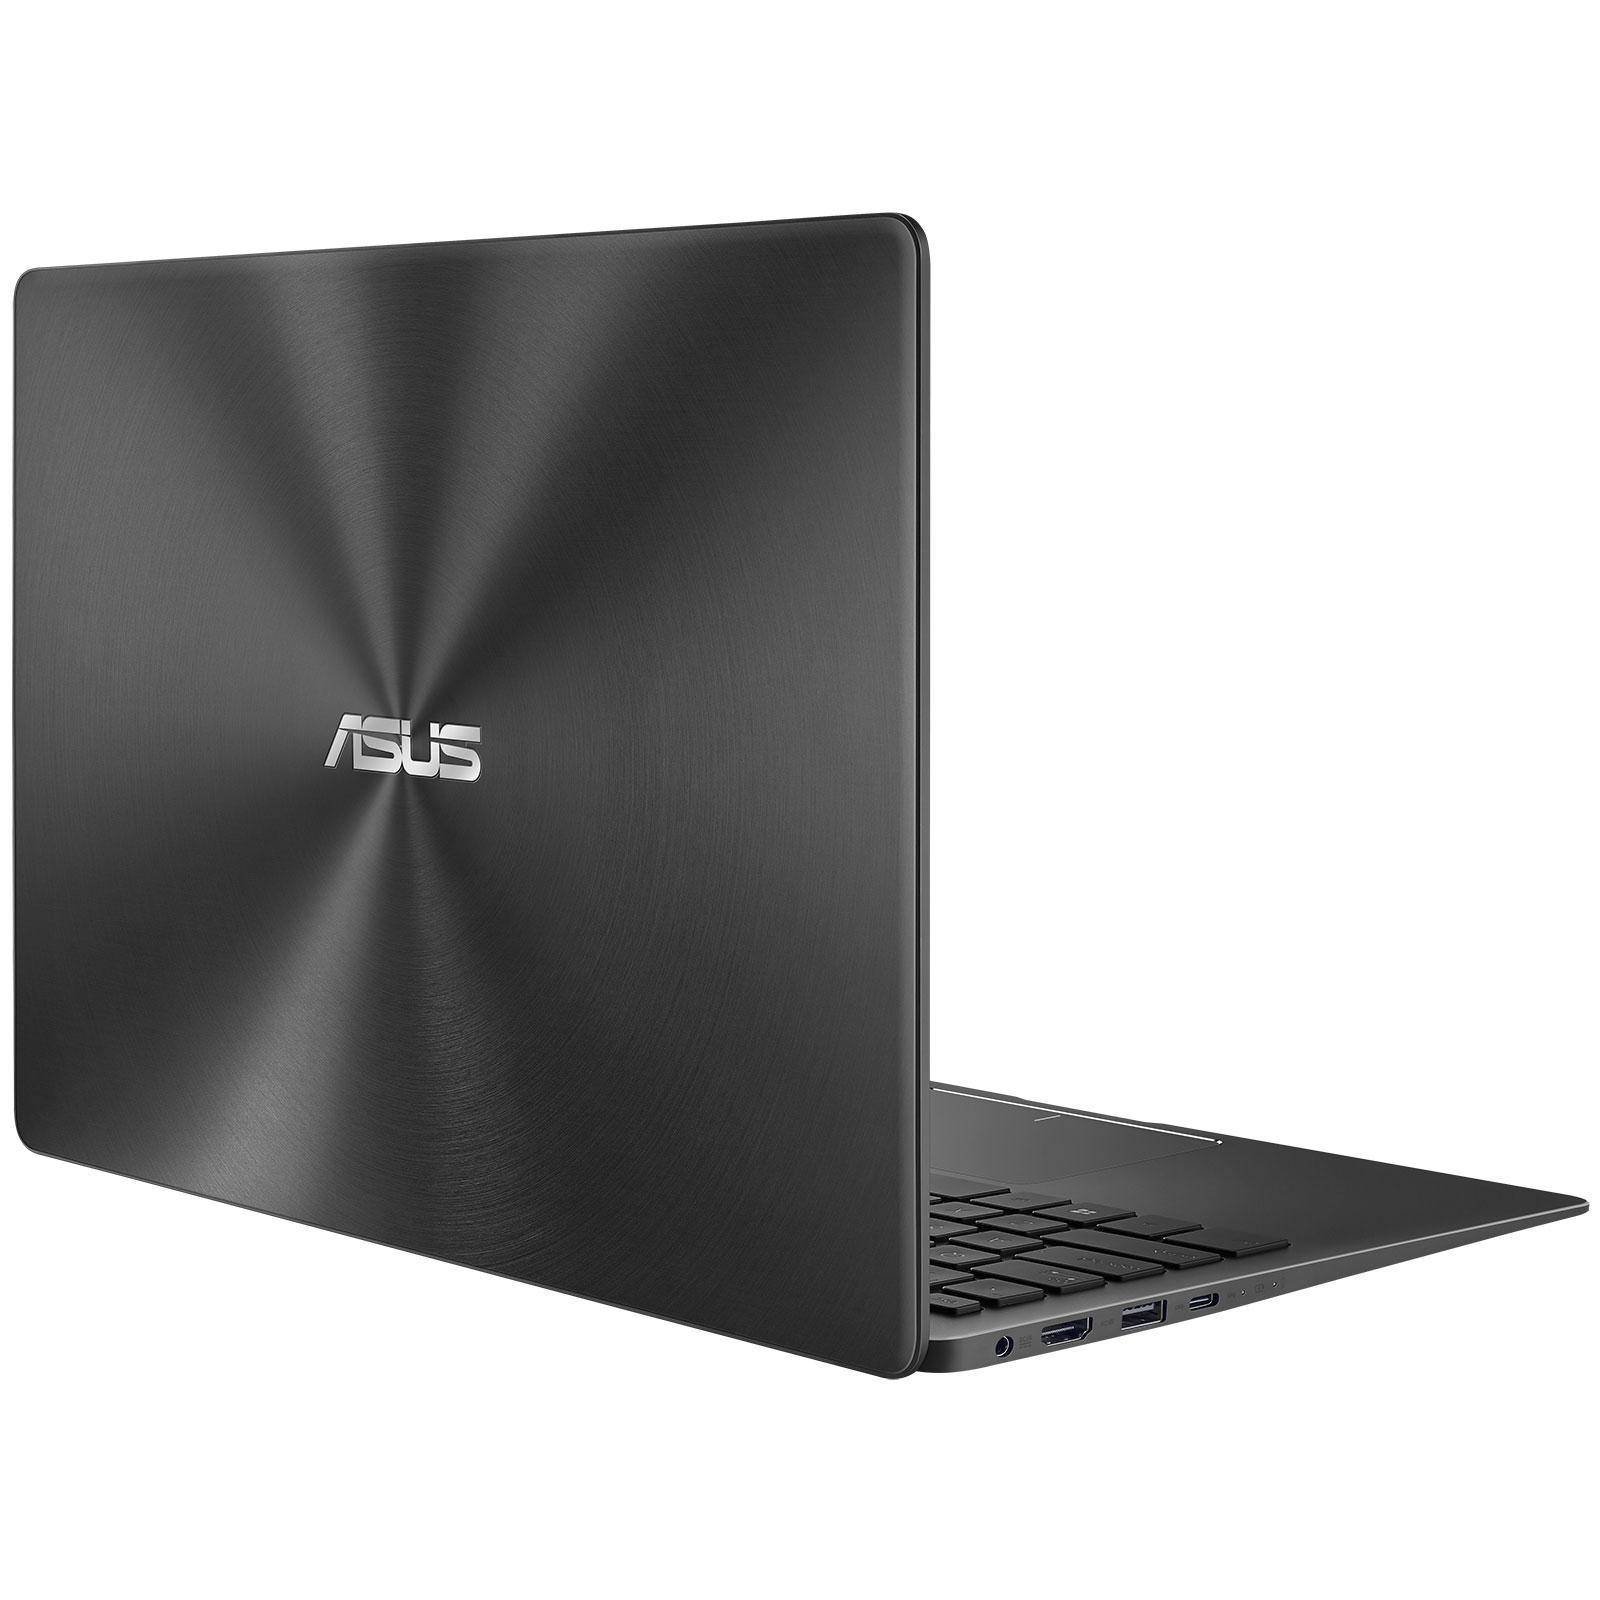 Asus UX331UA-EG011R - PC portable Asus - Cybertek.fr - 2